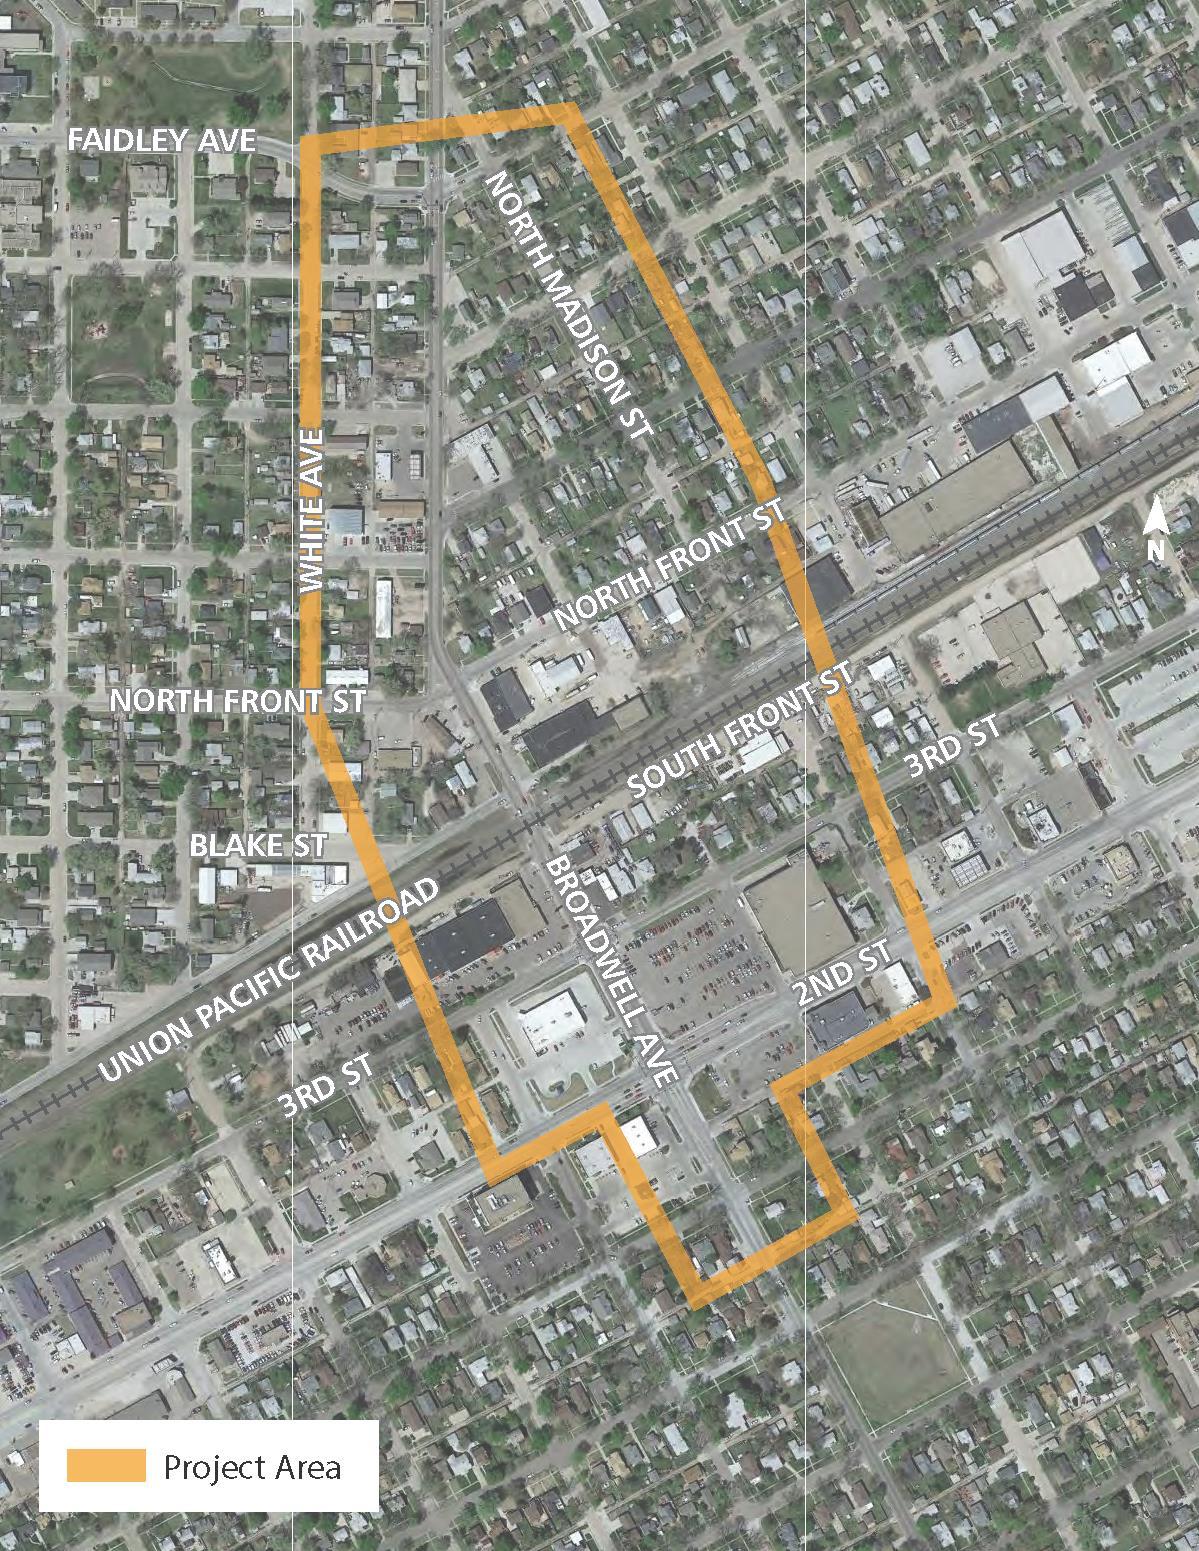 CityofGrandIsland_UPRR_ProjectArea-Map_20200218